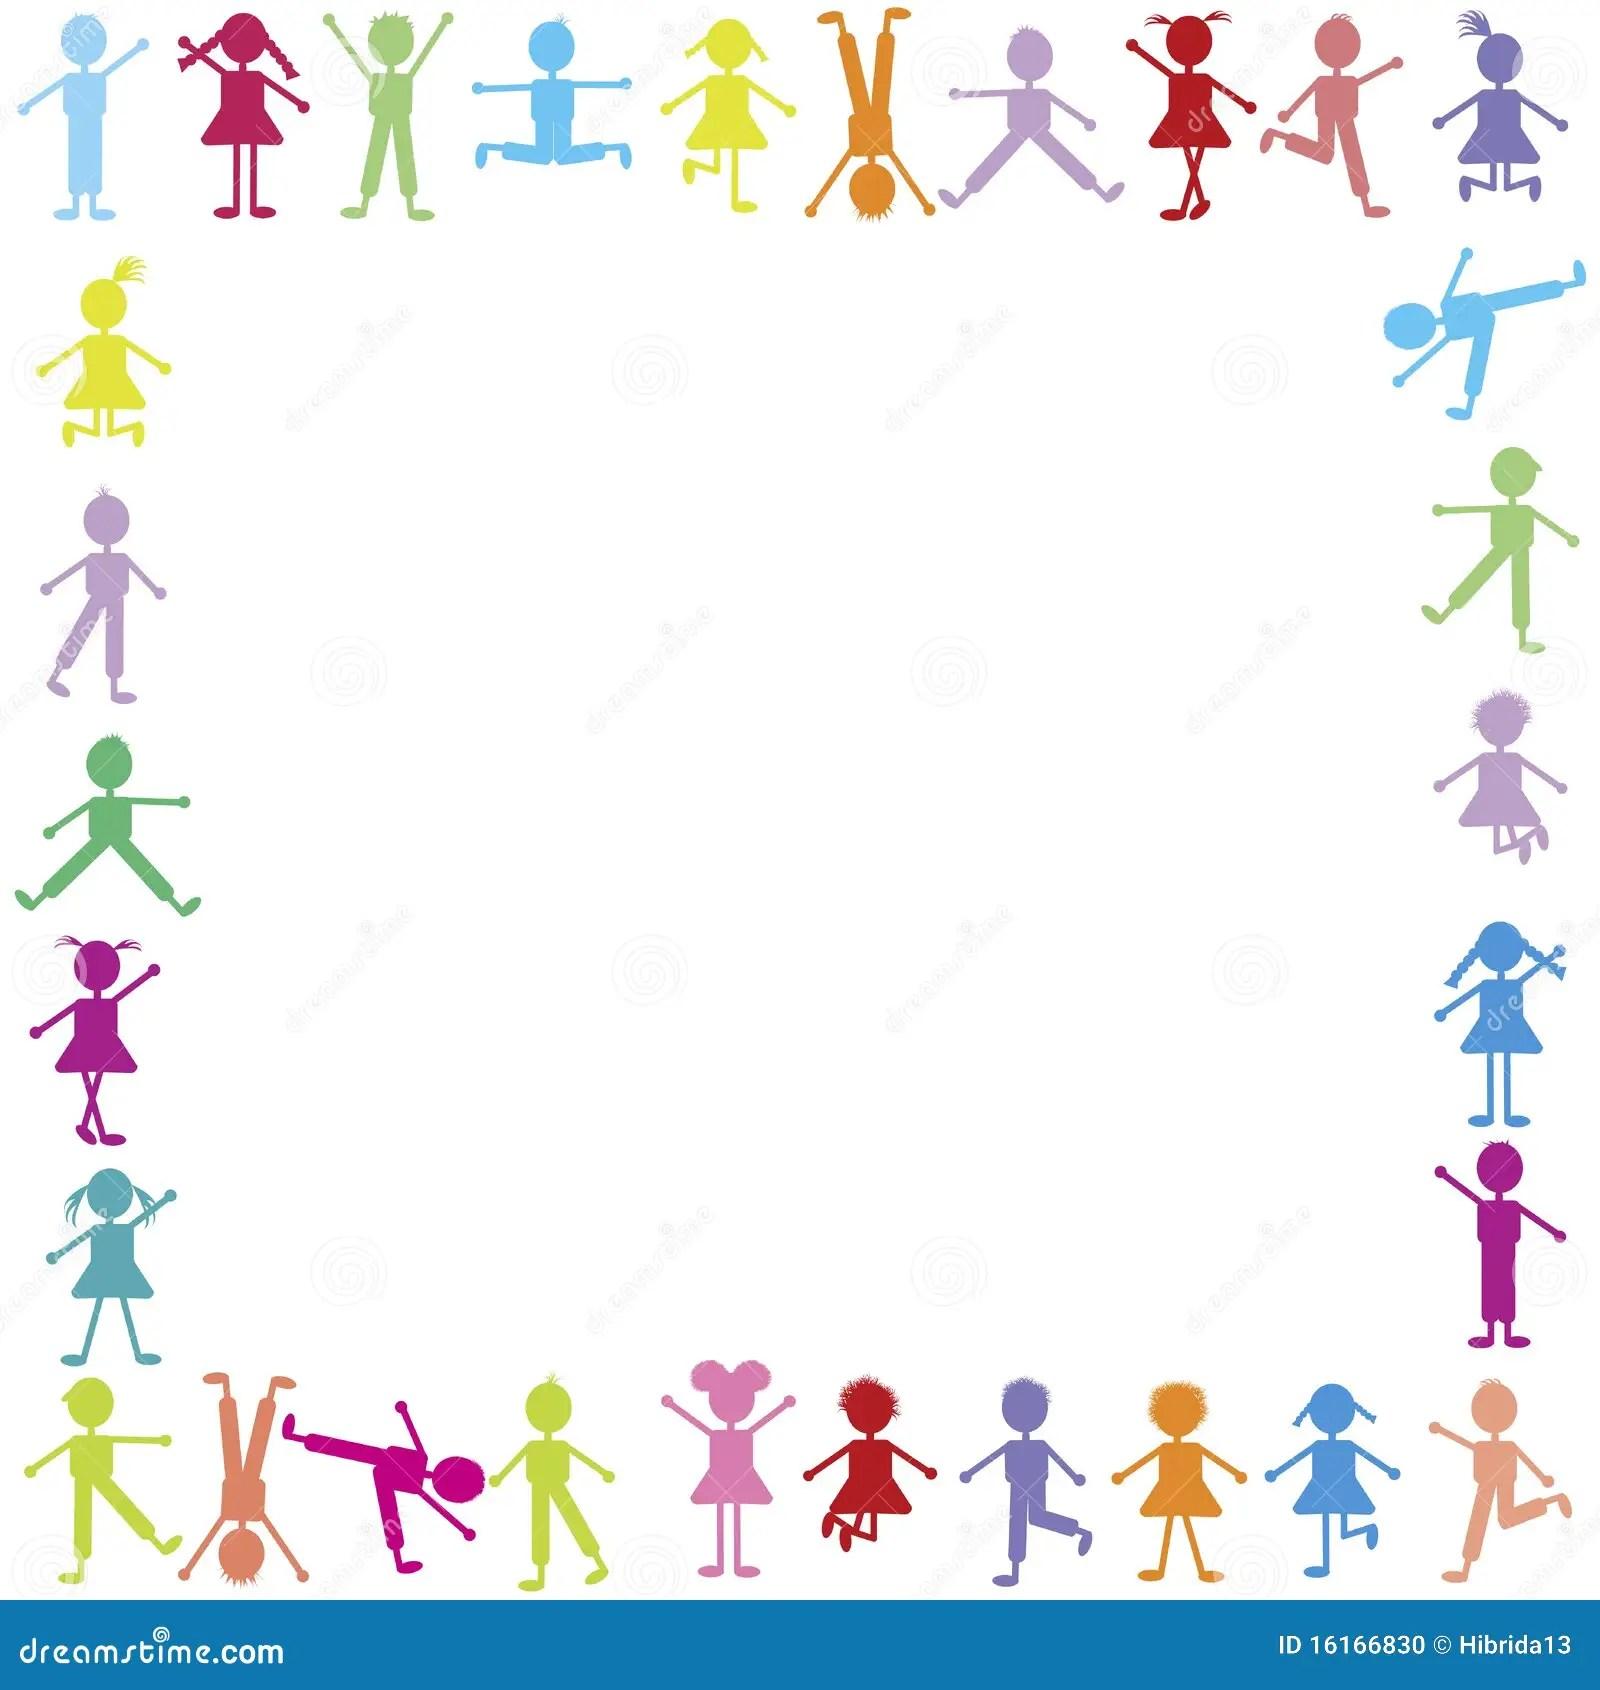 Colored Happy Children Frame Stock Photo